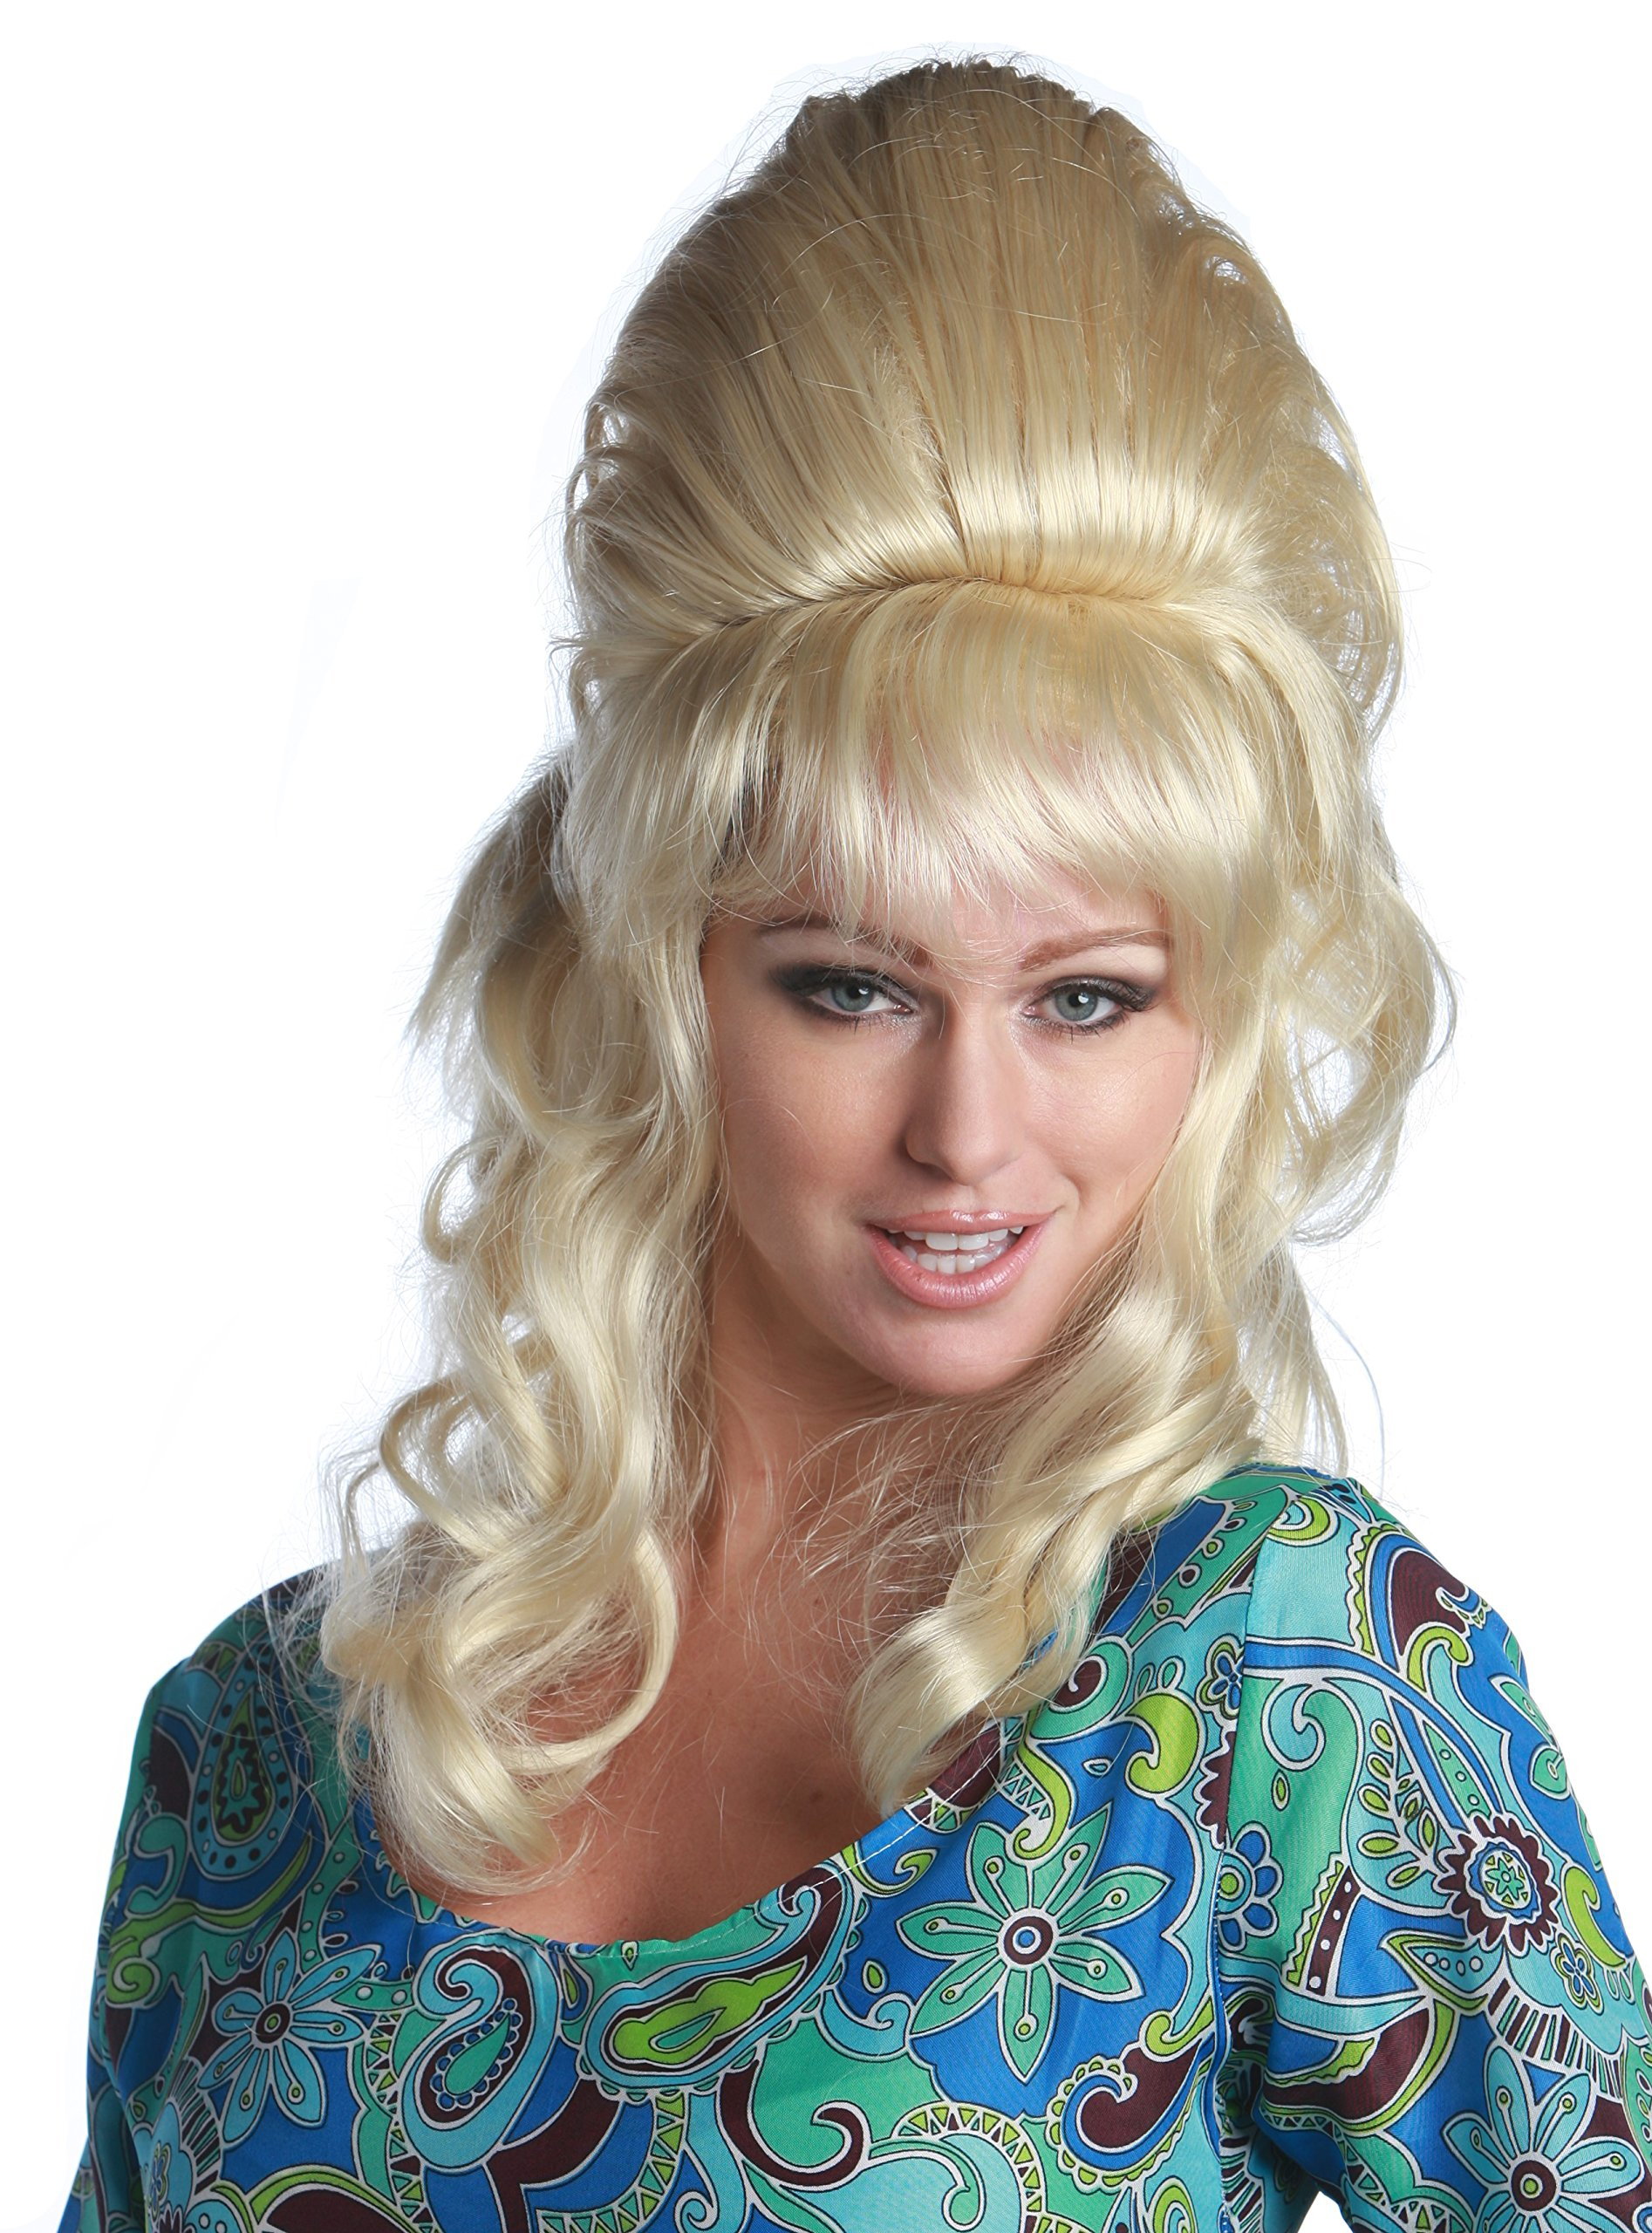 Premium Quality Austin Powers Fembot Beehive Wig - Blond